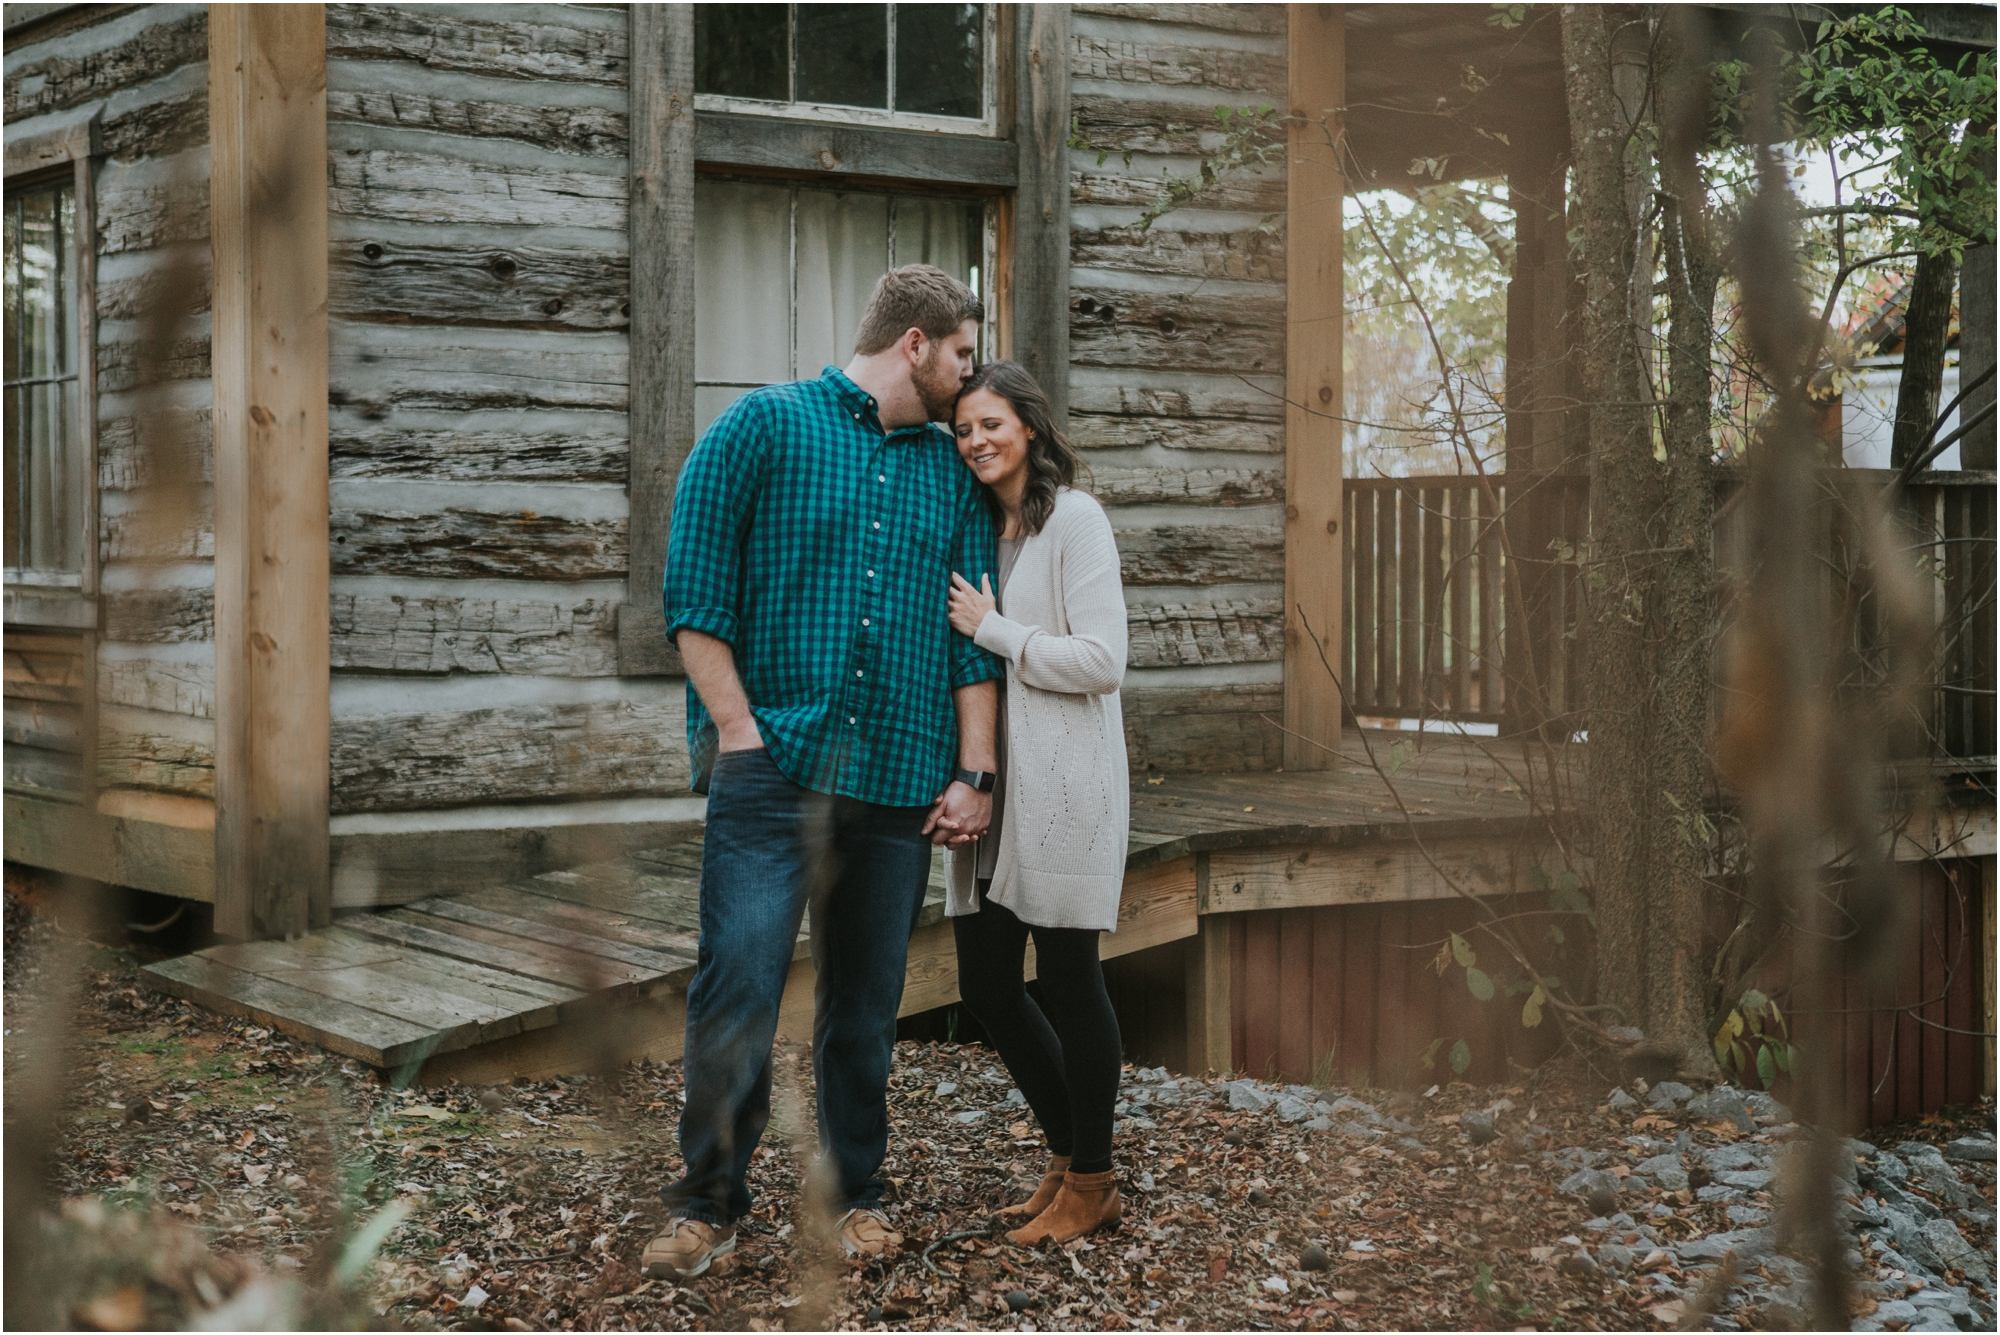 katy-sergent-millstone-limestone-tn-rustic-fall-engagement-session-adventurous-outdoors-intimate-elopement-wedding-northeast-johnson-city-photographer_0033.jpg